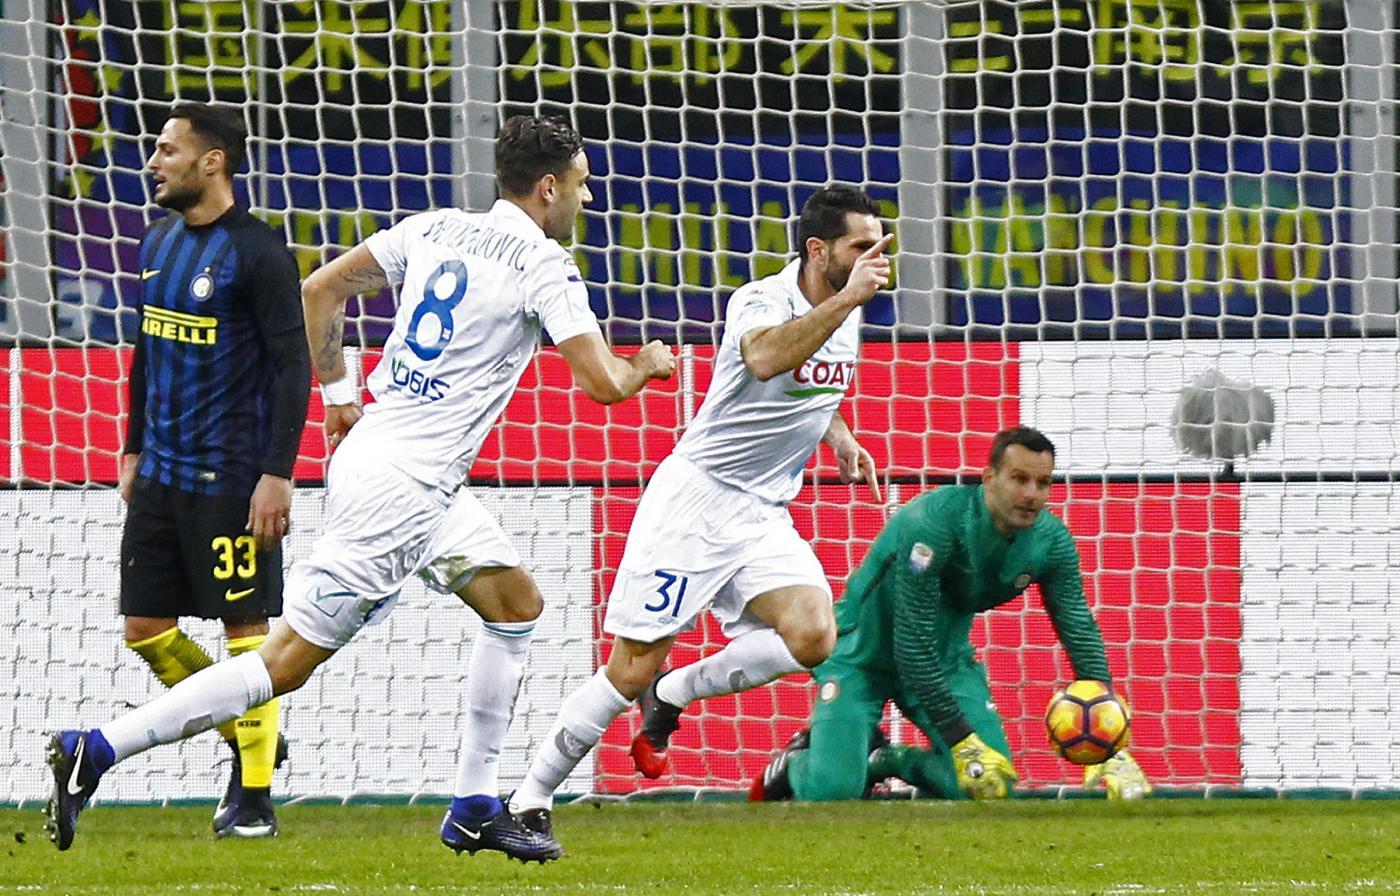 L'Inter infila la quinta, Chievo ko